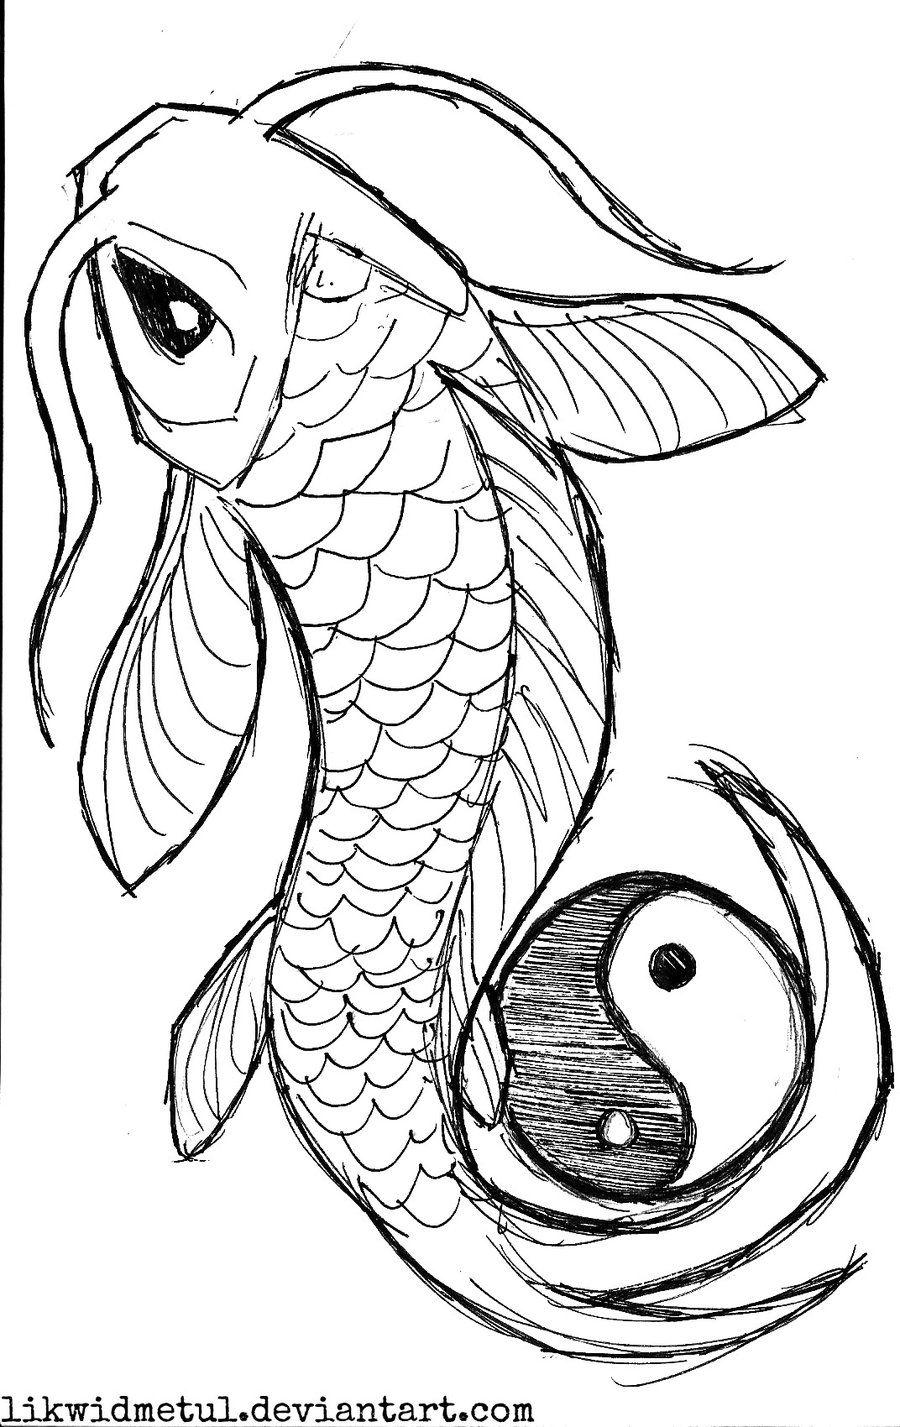 koi fish tattoo designs koi fish tattoo designs pinterest koi fish tattoo fish tattoos. Black Bedroom Furniture Sets. Home Design Ideas